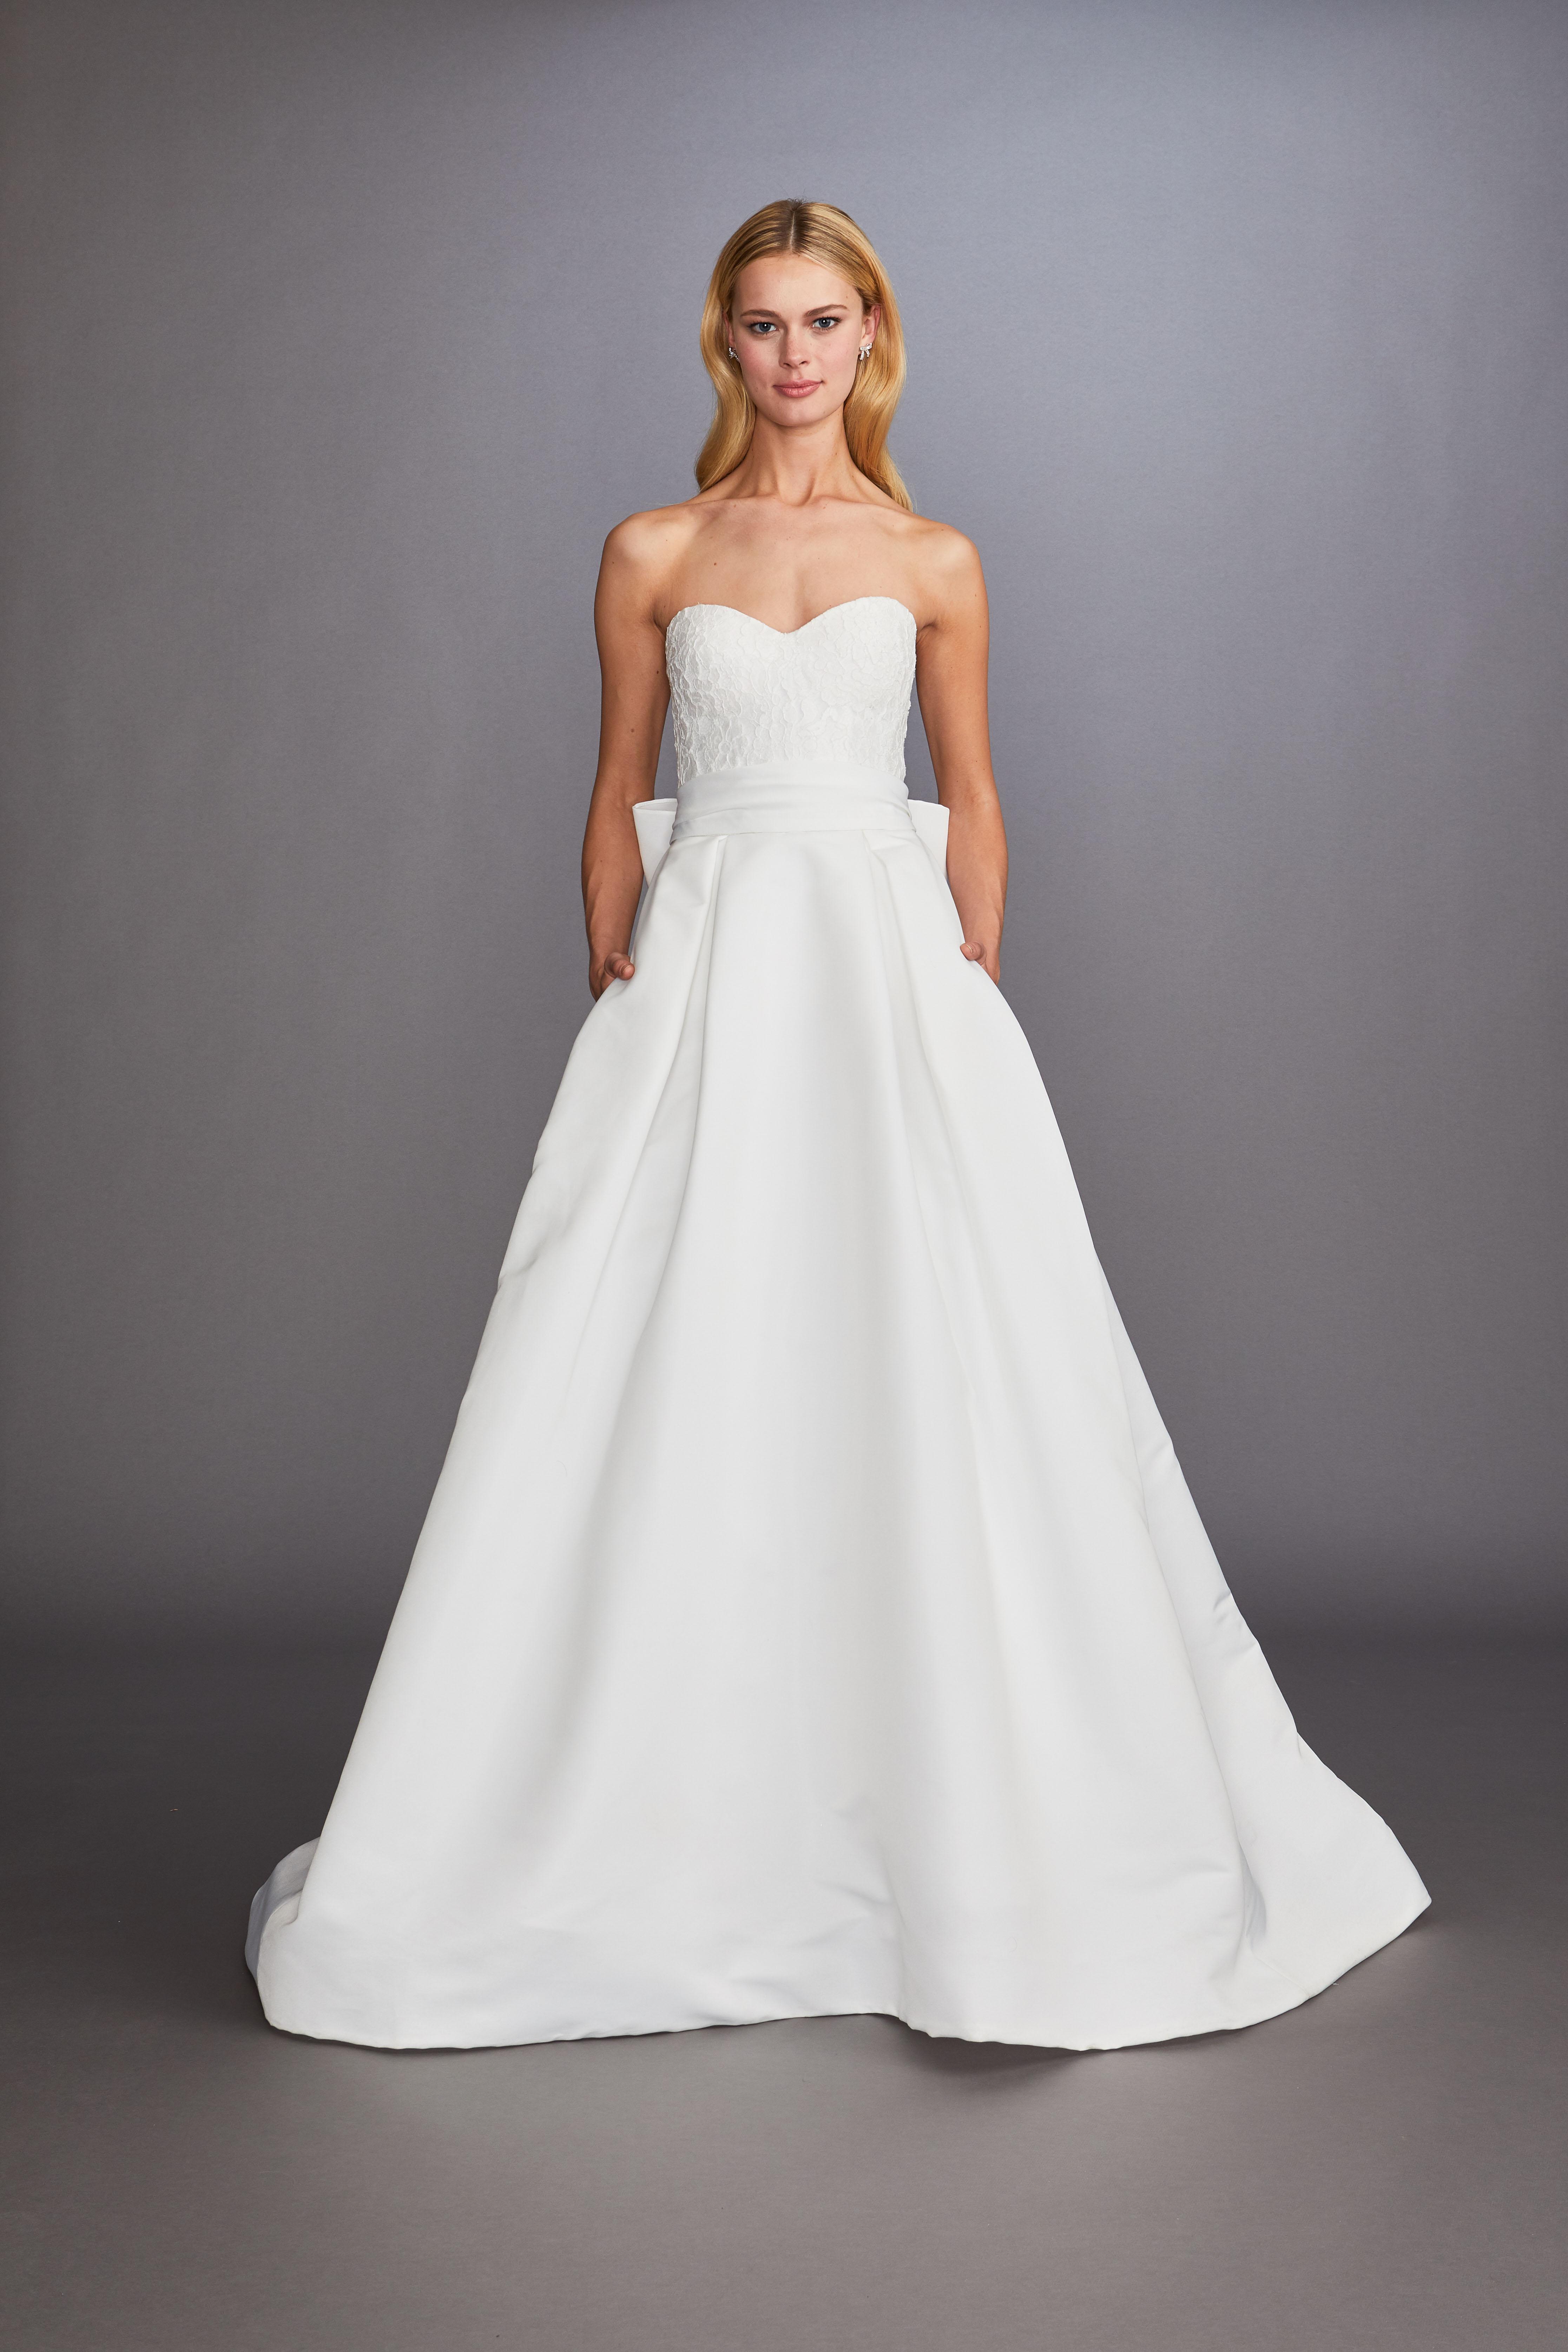 strapless sweetheart neckline a-line wedding dress Allison Webb Spring 2020